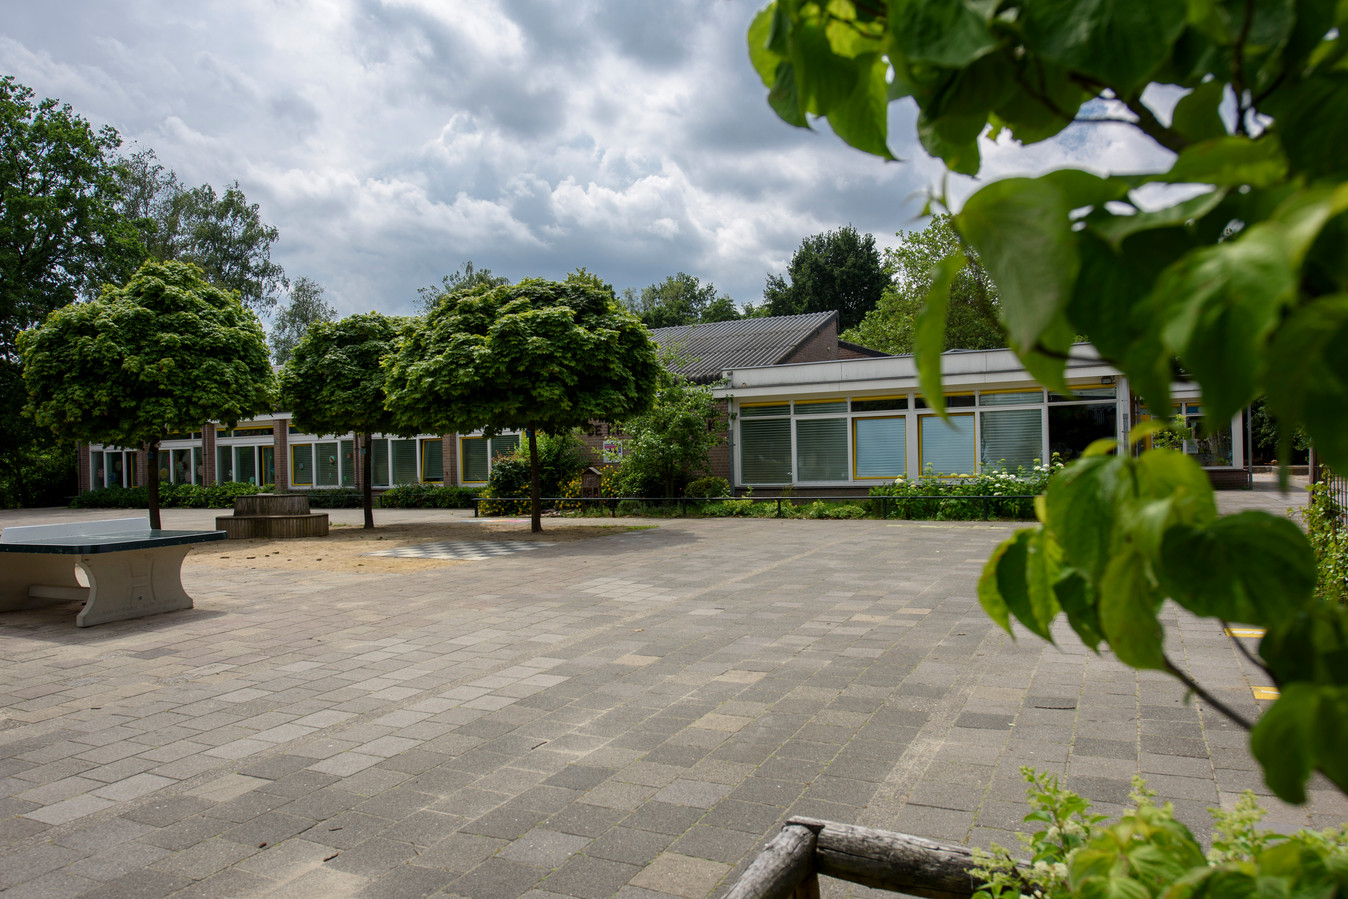 Basisschool De Krommen Hoek in Breugel.